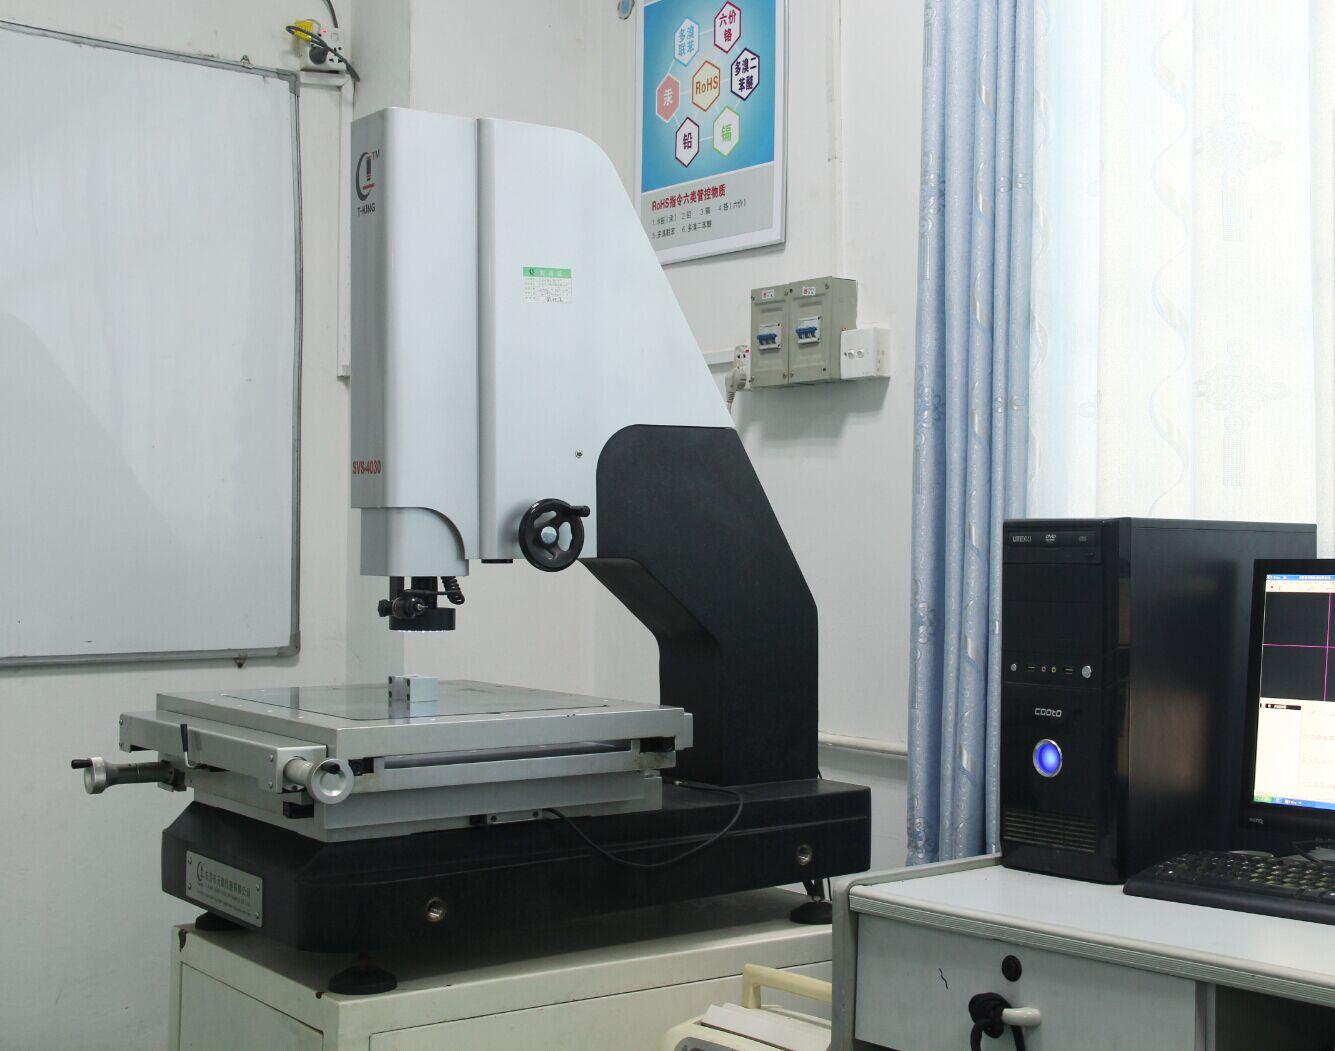 2.5D measuring projector